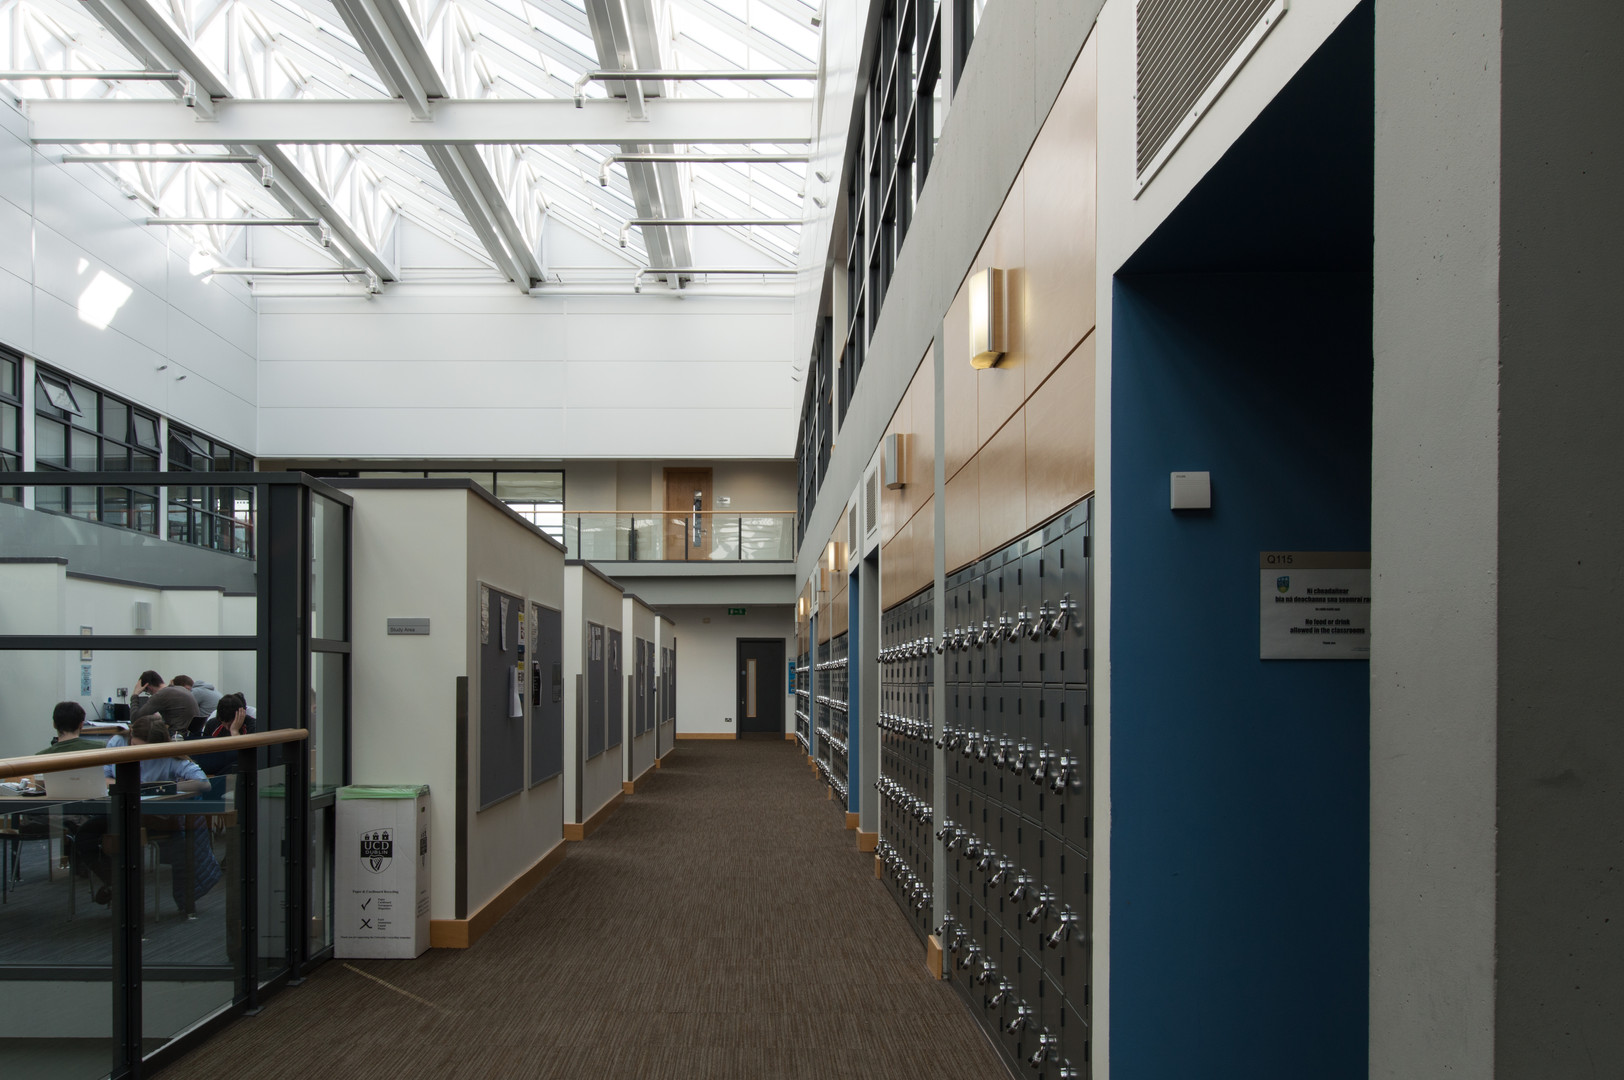 First floor of the interior atrium of the Quinn School of Business, UCD, Dublin